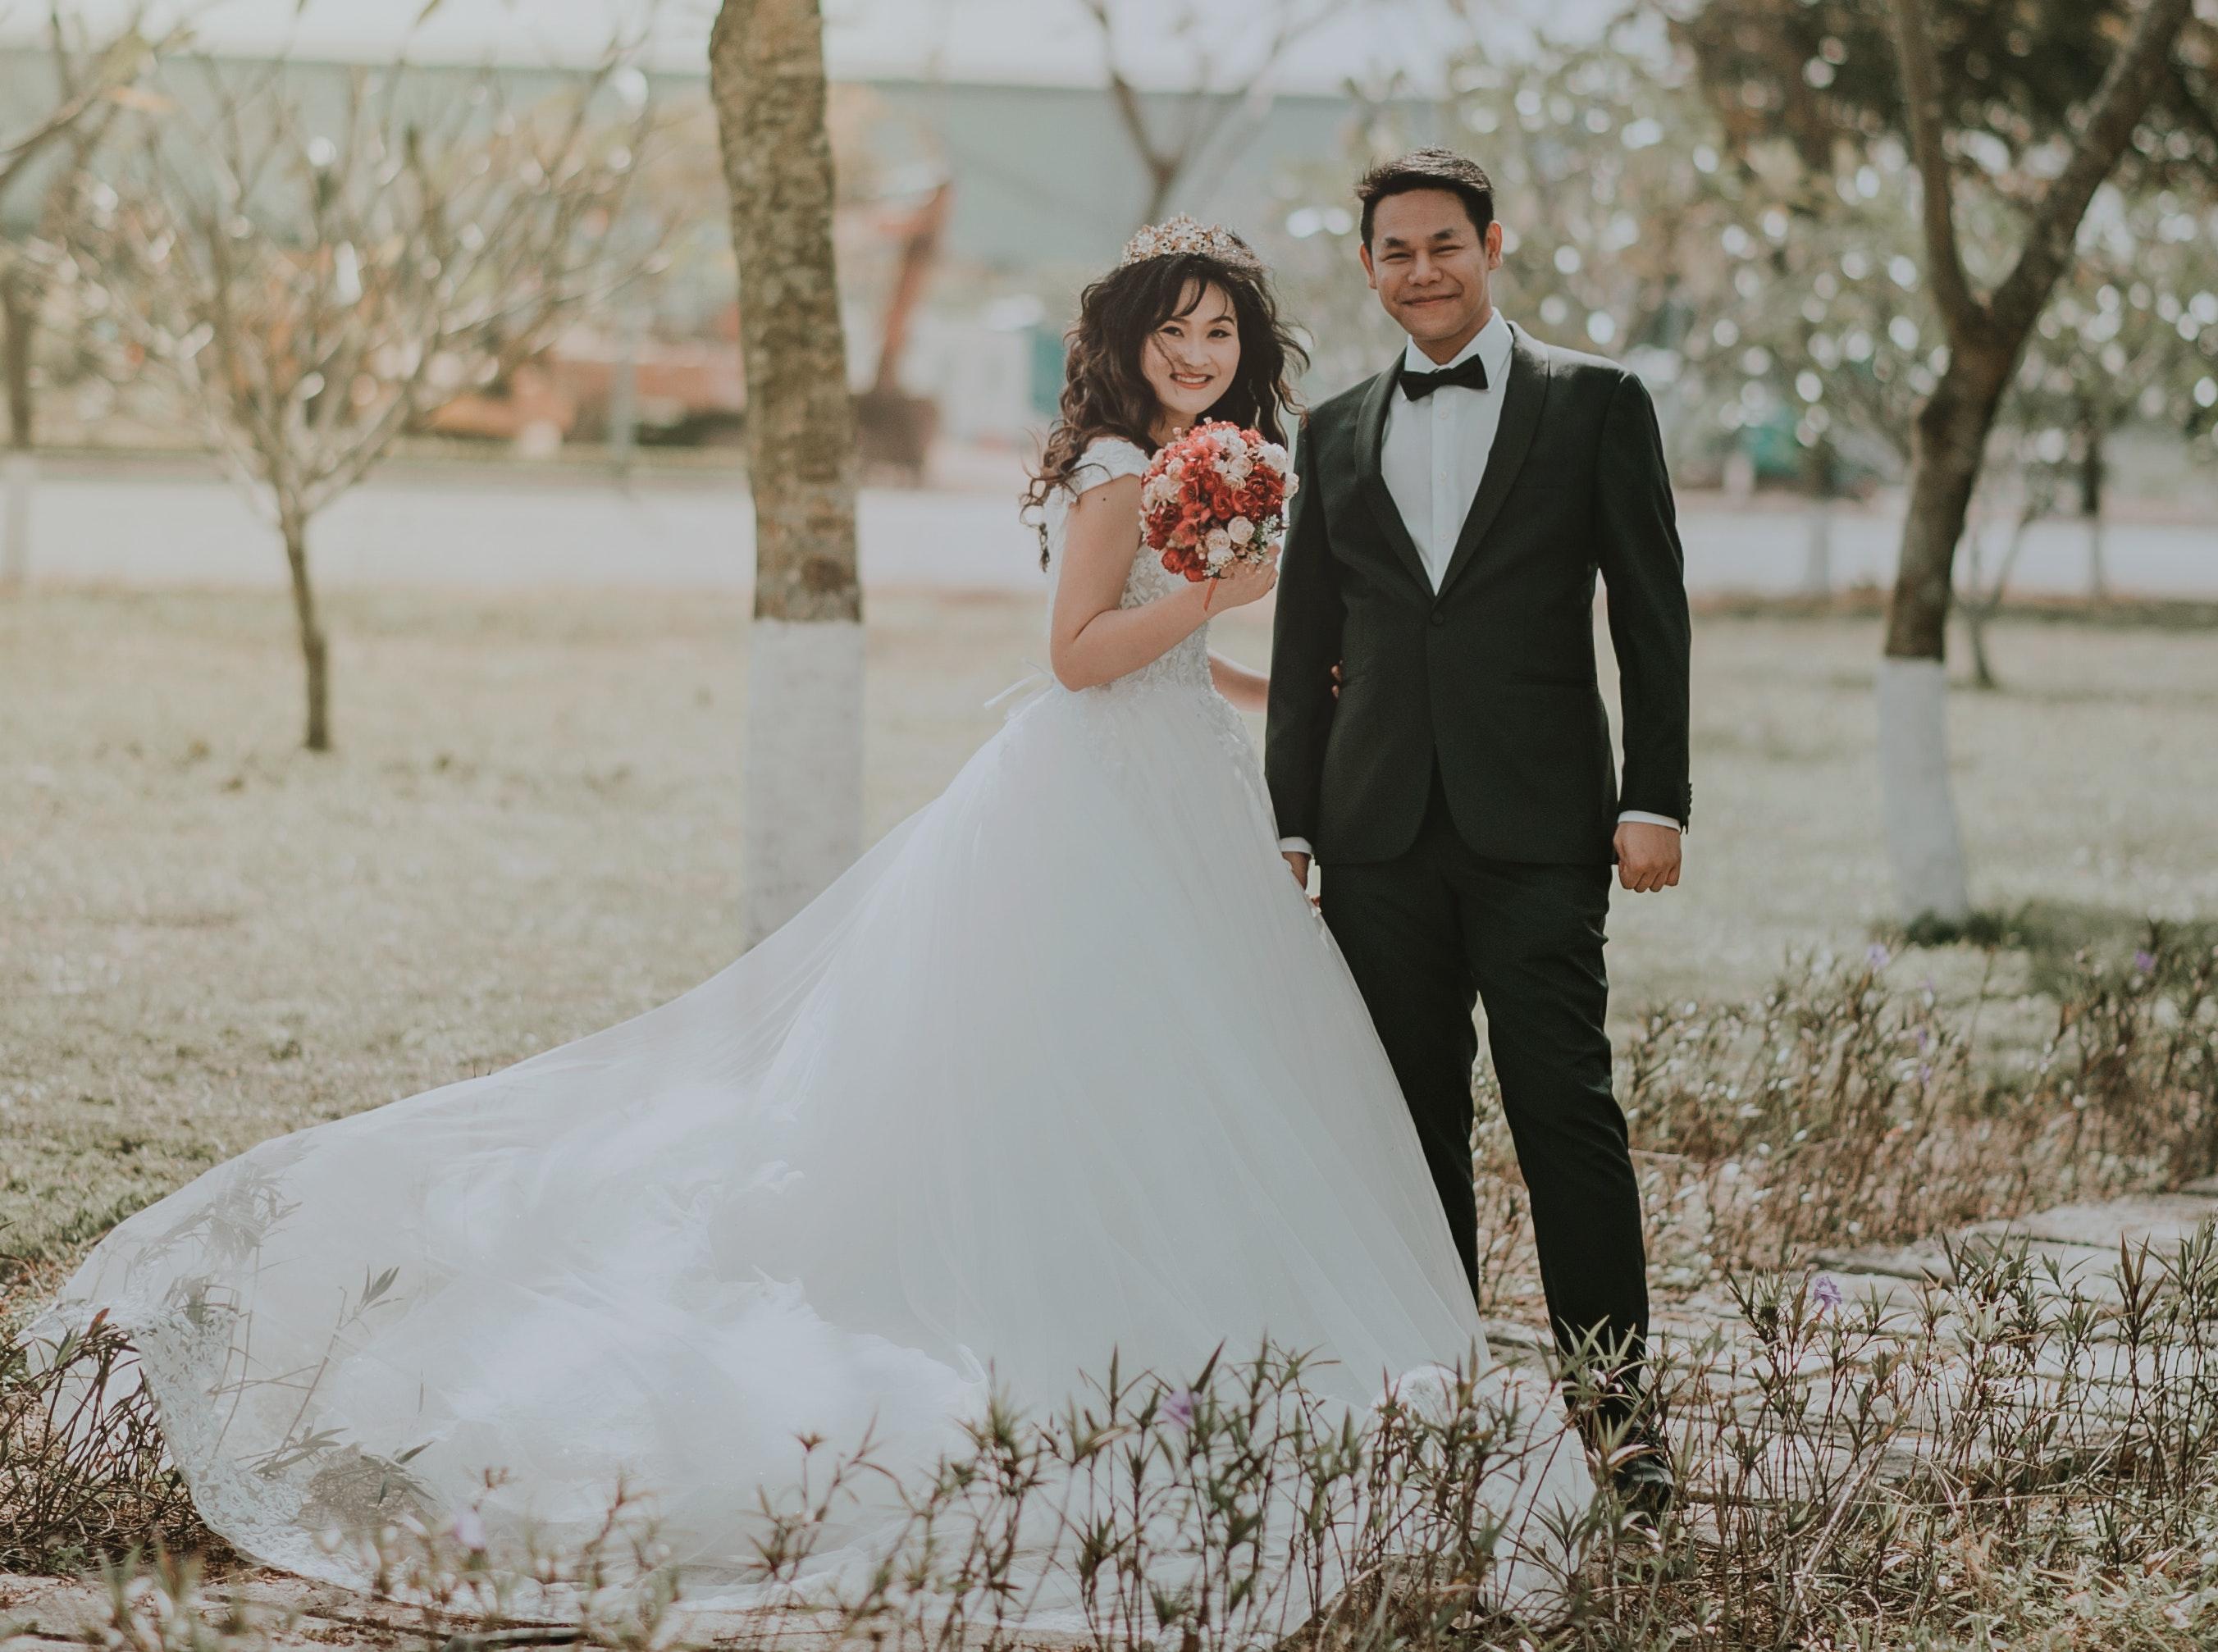 Woman wearing white wedding ball beside man wearing black notch-lapel suit on pathway near the green grass field photo